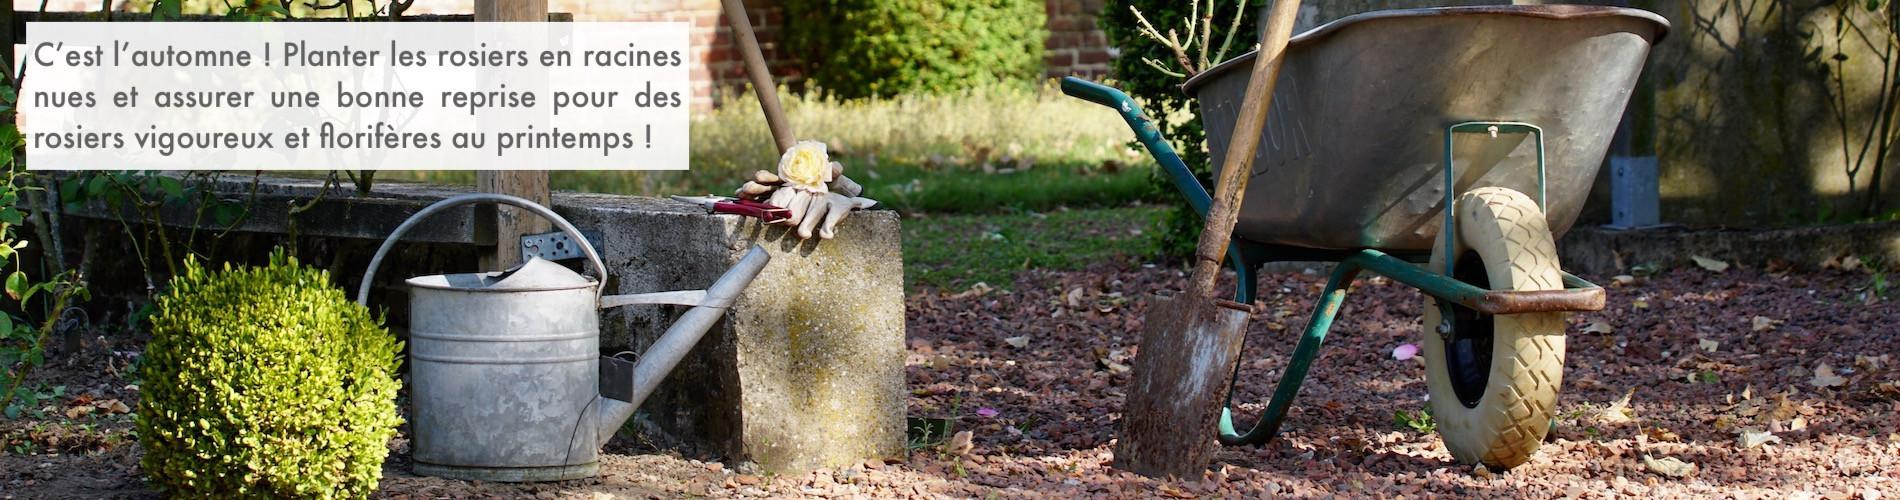 A la sainte Catherine, tout bois prend racines.